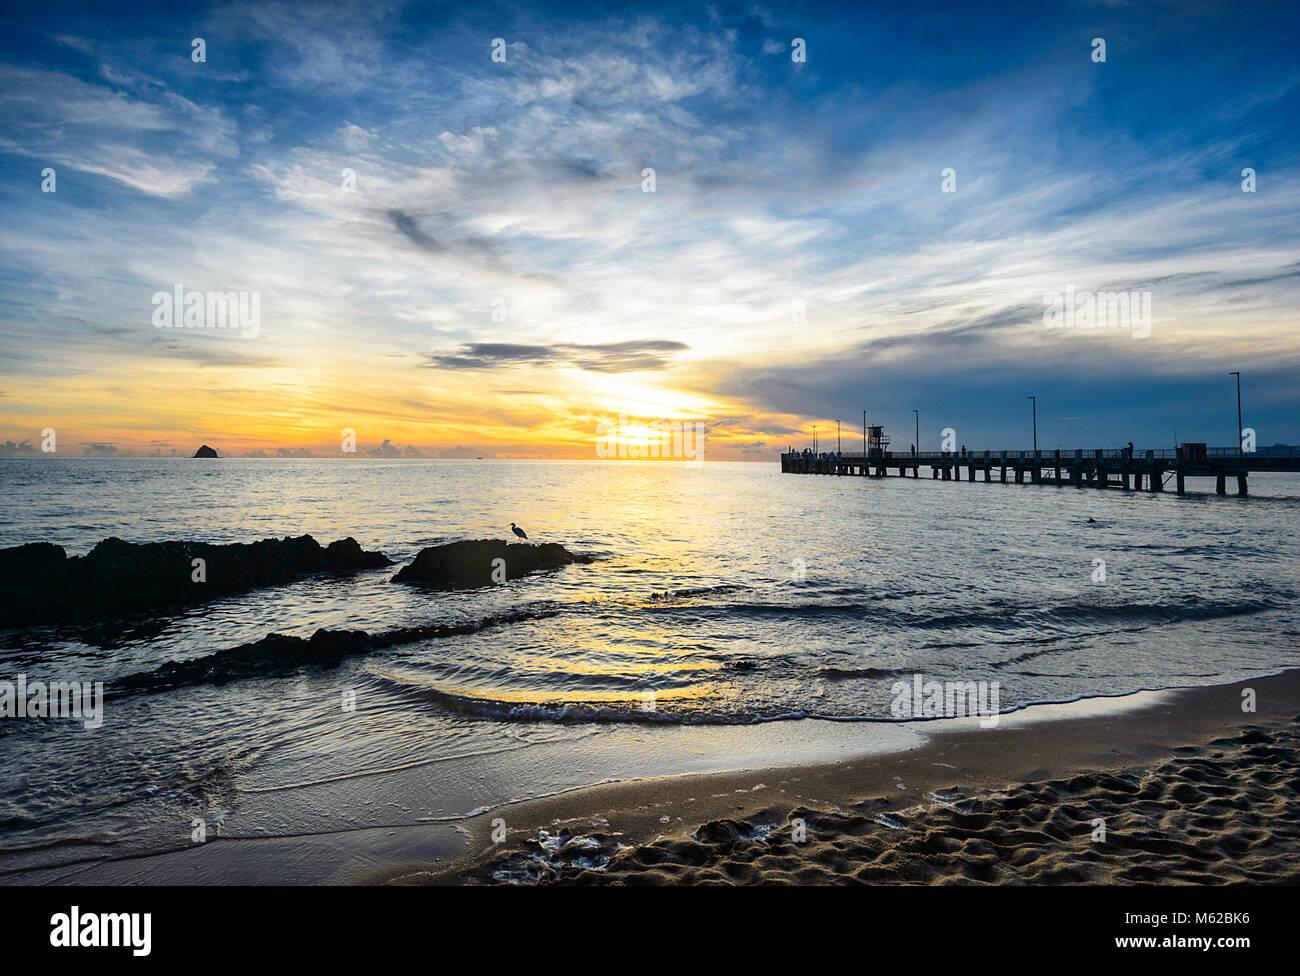 Fiery espectacular amanecer en Palm Cove, playas del norte de Cairns, Far North Queensland, FNQ, Queensland, Australia Imagen De Stock